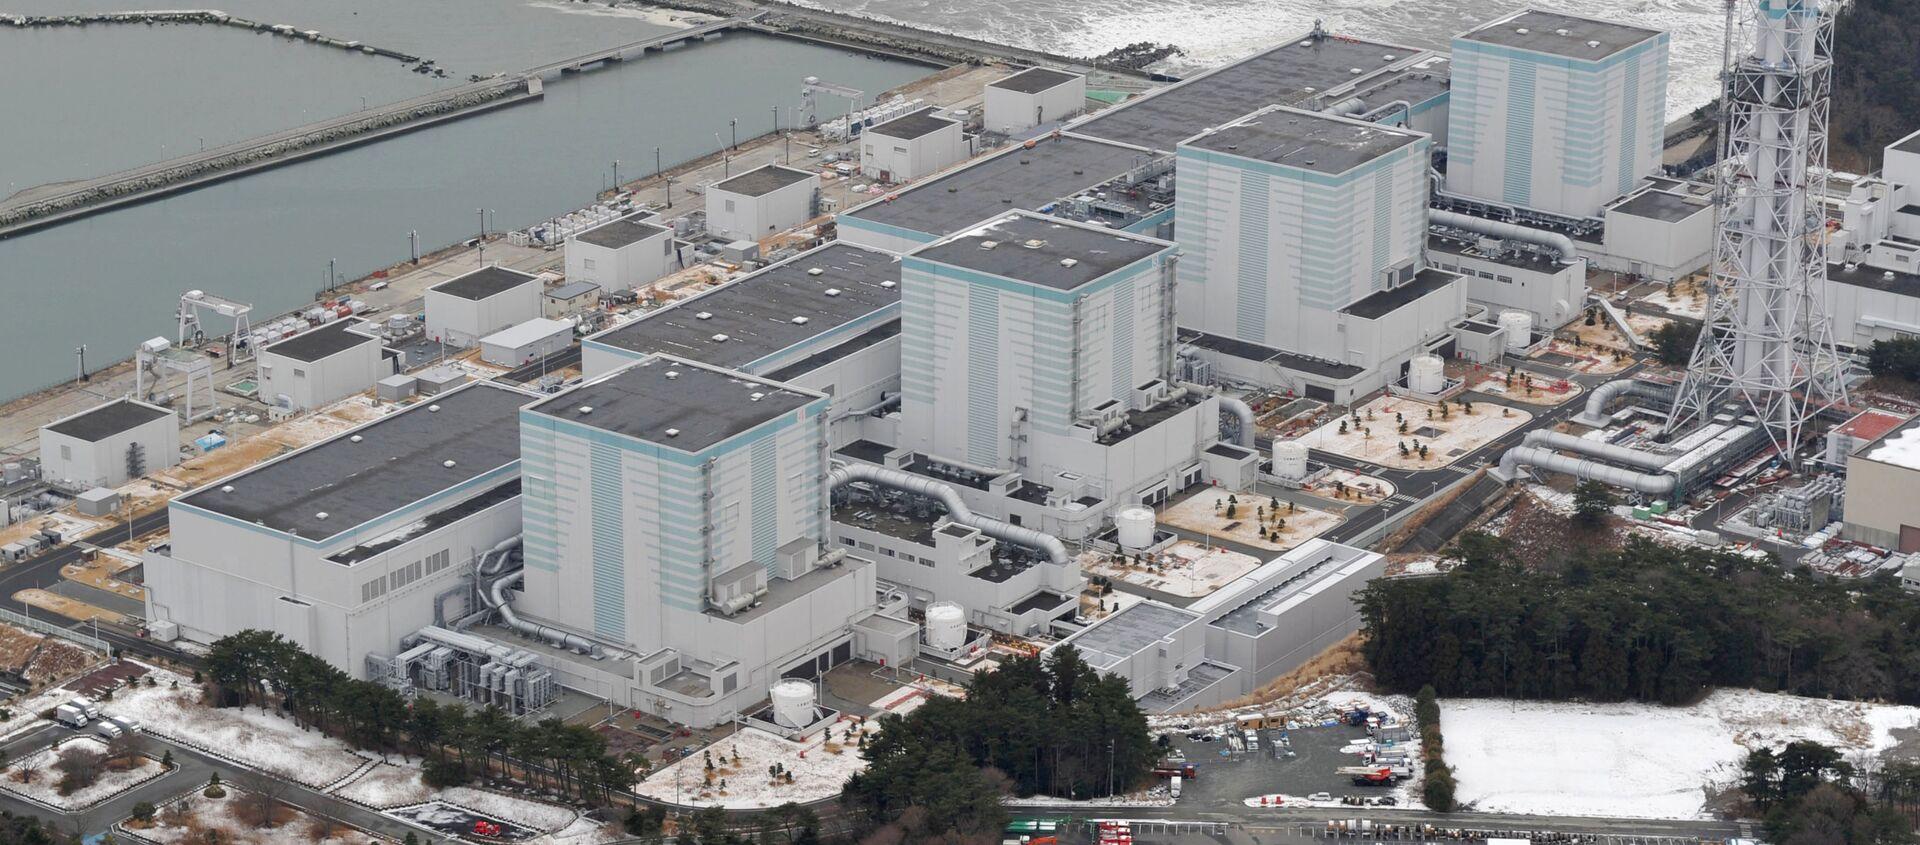 La central nuclear japonesa de Fukushima - Sputnik Mundo, 1920, 16.10.2020